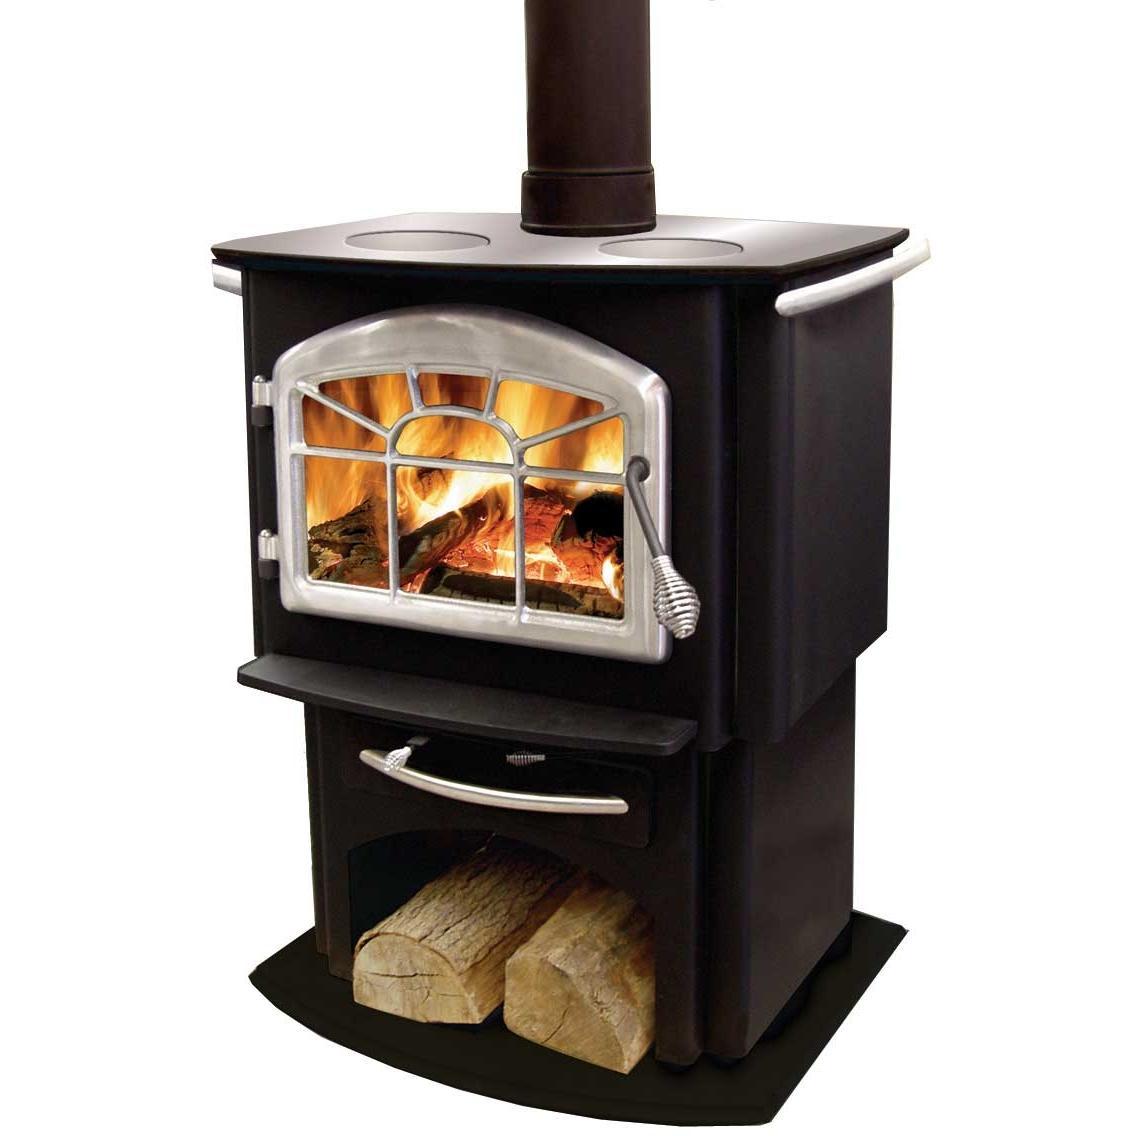 Napoleon 1150P Gourmet Wood Burning Cook Stove - Black